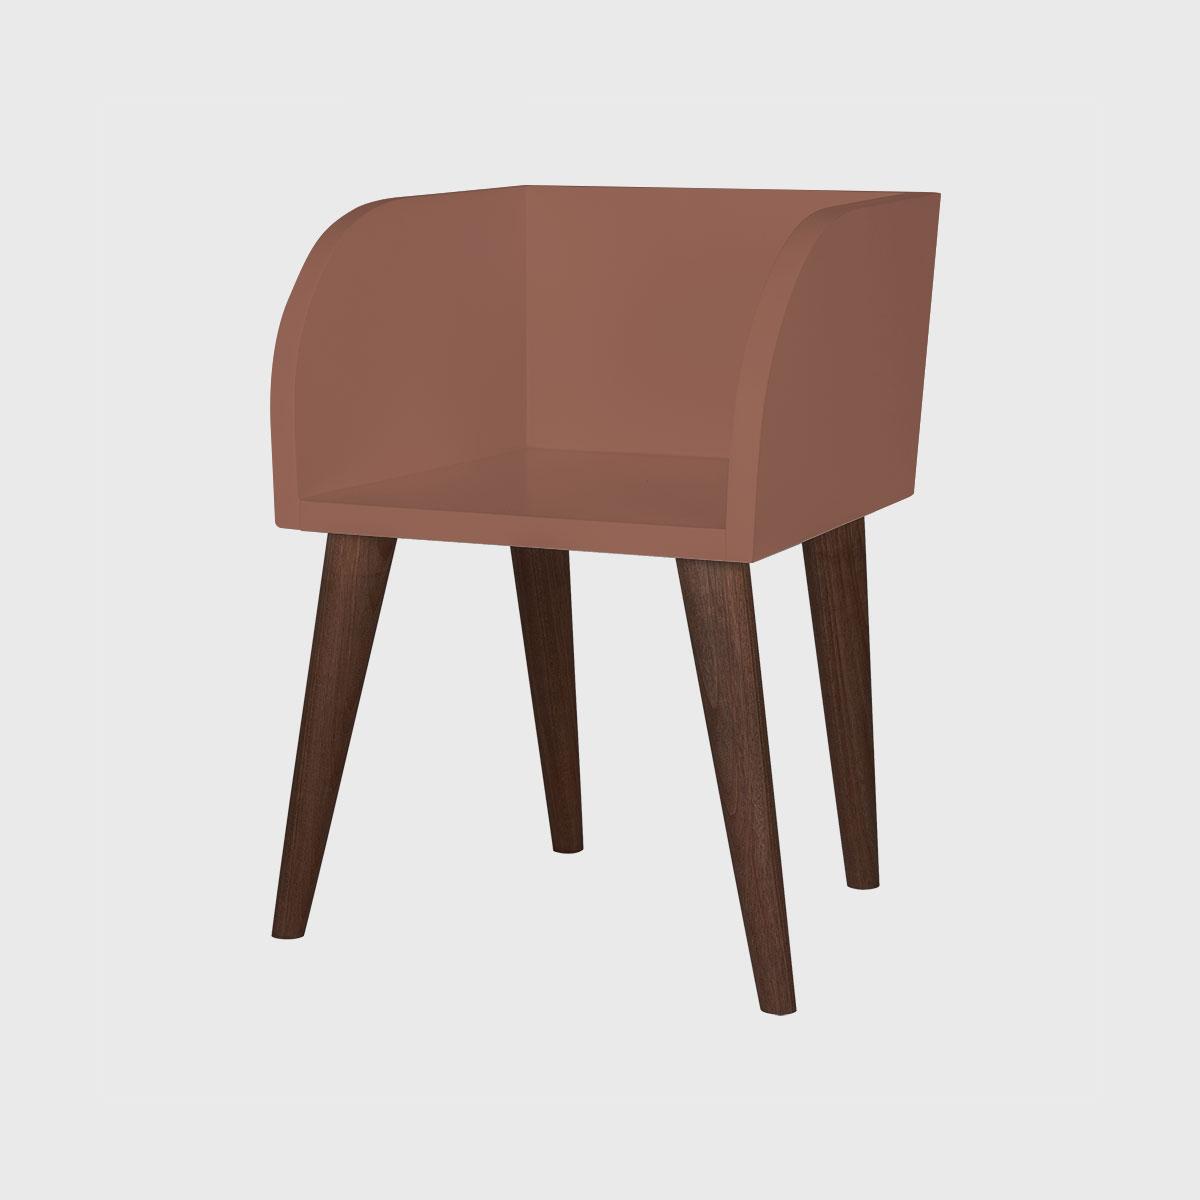 Cadeira ioio jequitibá chocolate pintada